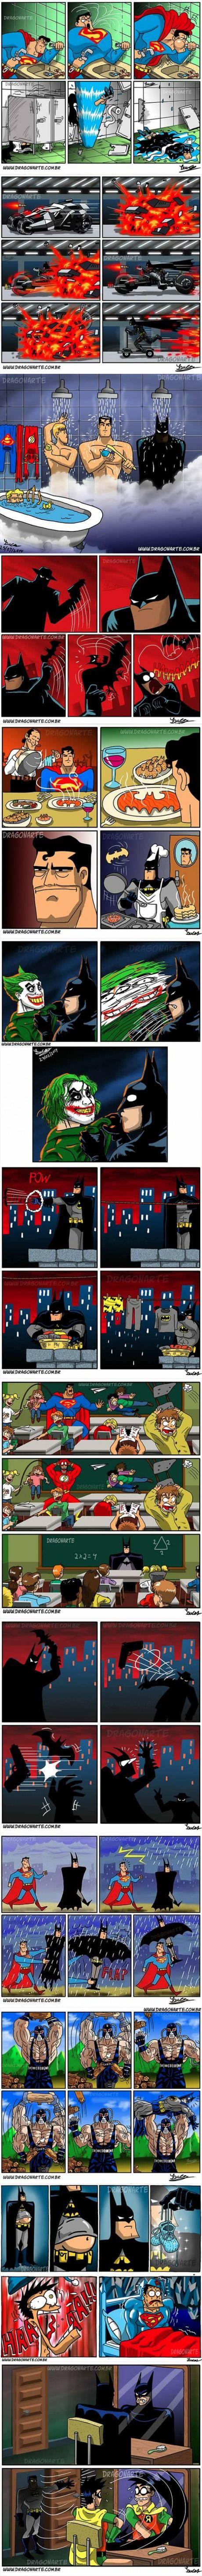 The Funniest Superhero Comics Collection (Part 1)